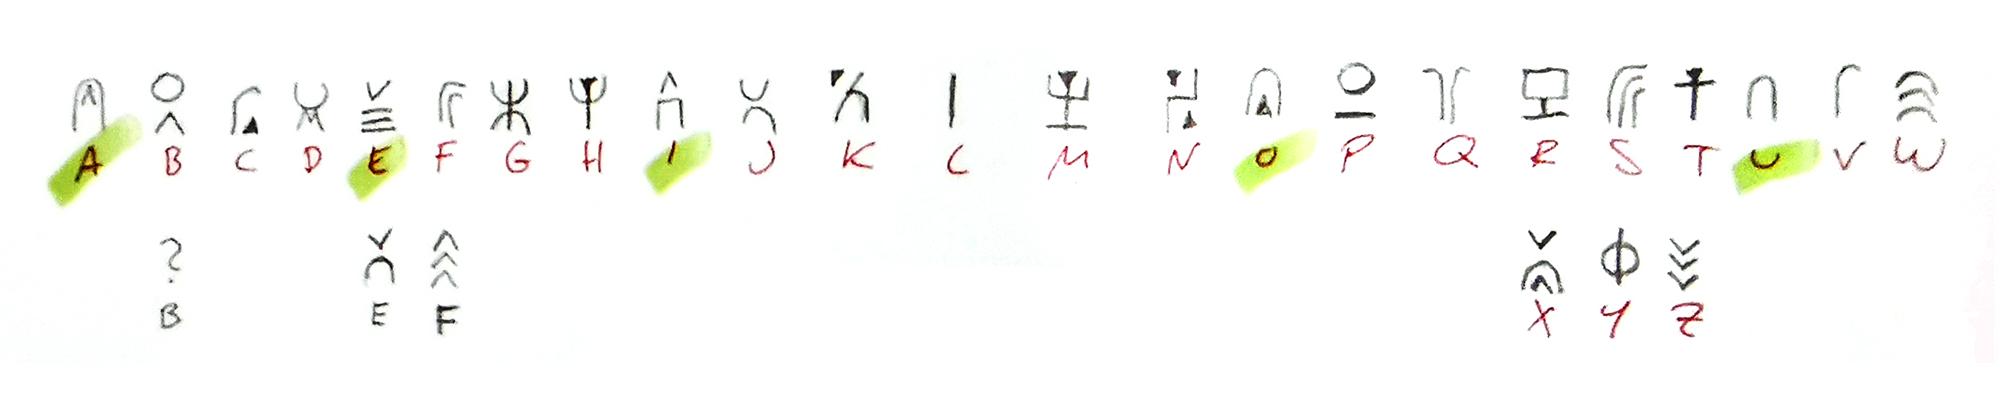 Orcish Alphabet/Runes